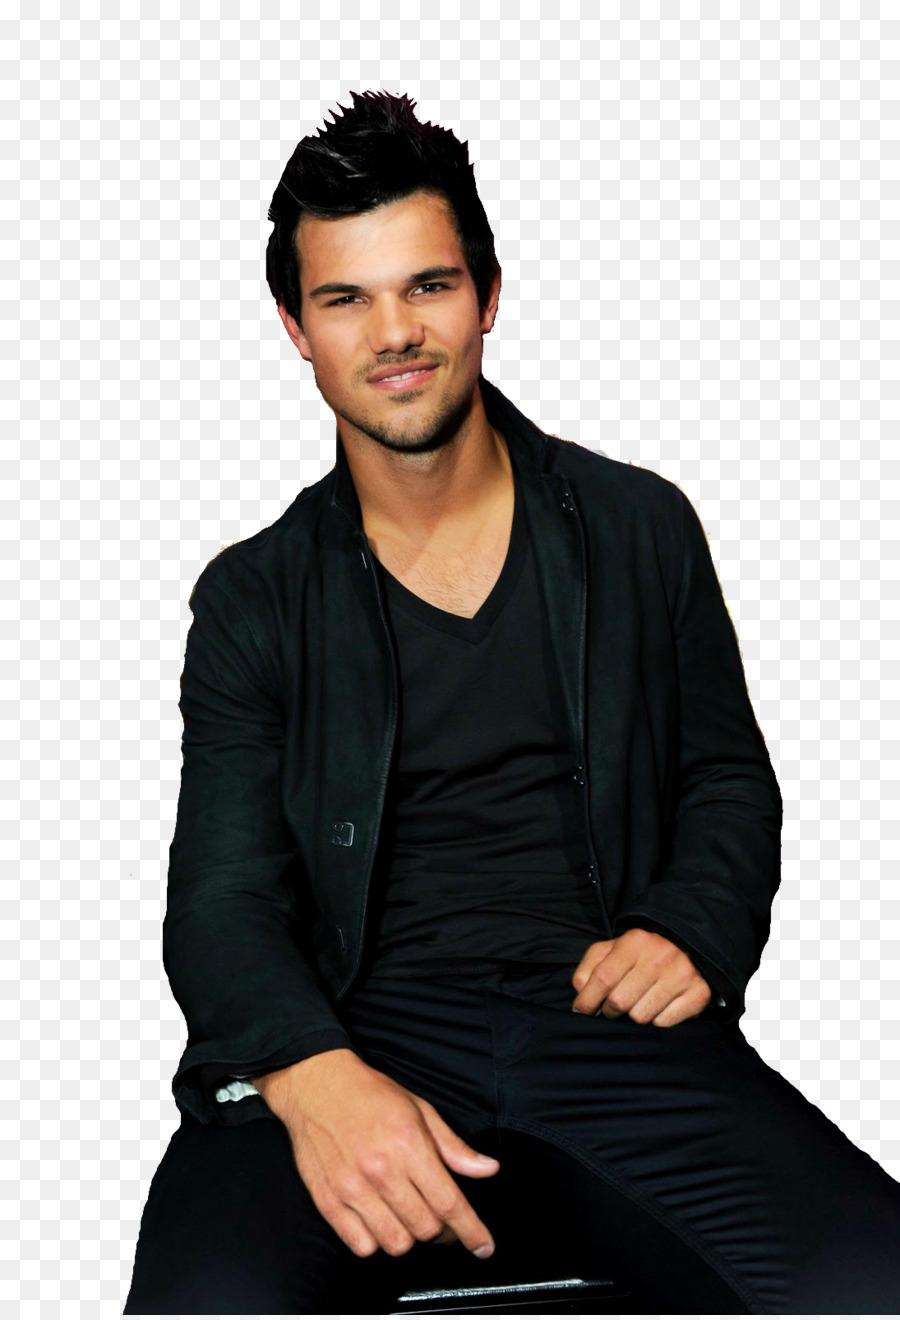 Descarga gratuita de Taylor Lautner, Camiseta, Jacob Black Imágen de Png